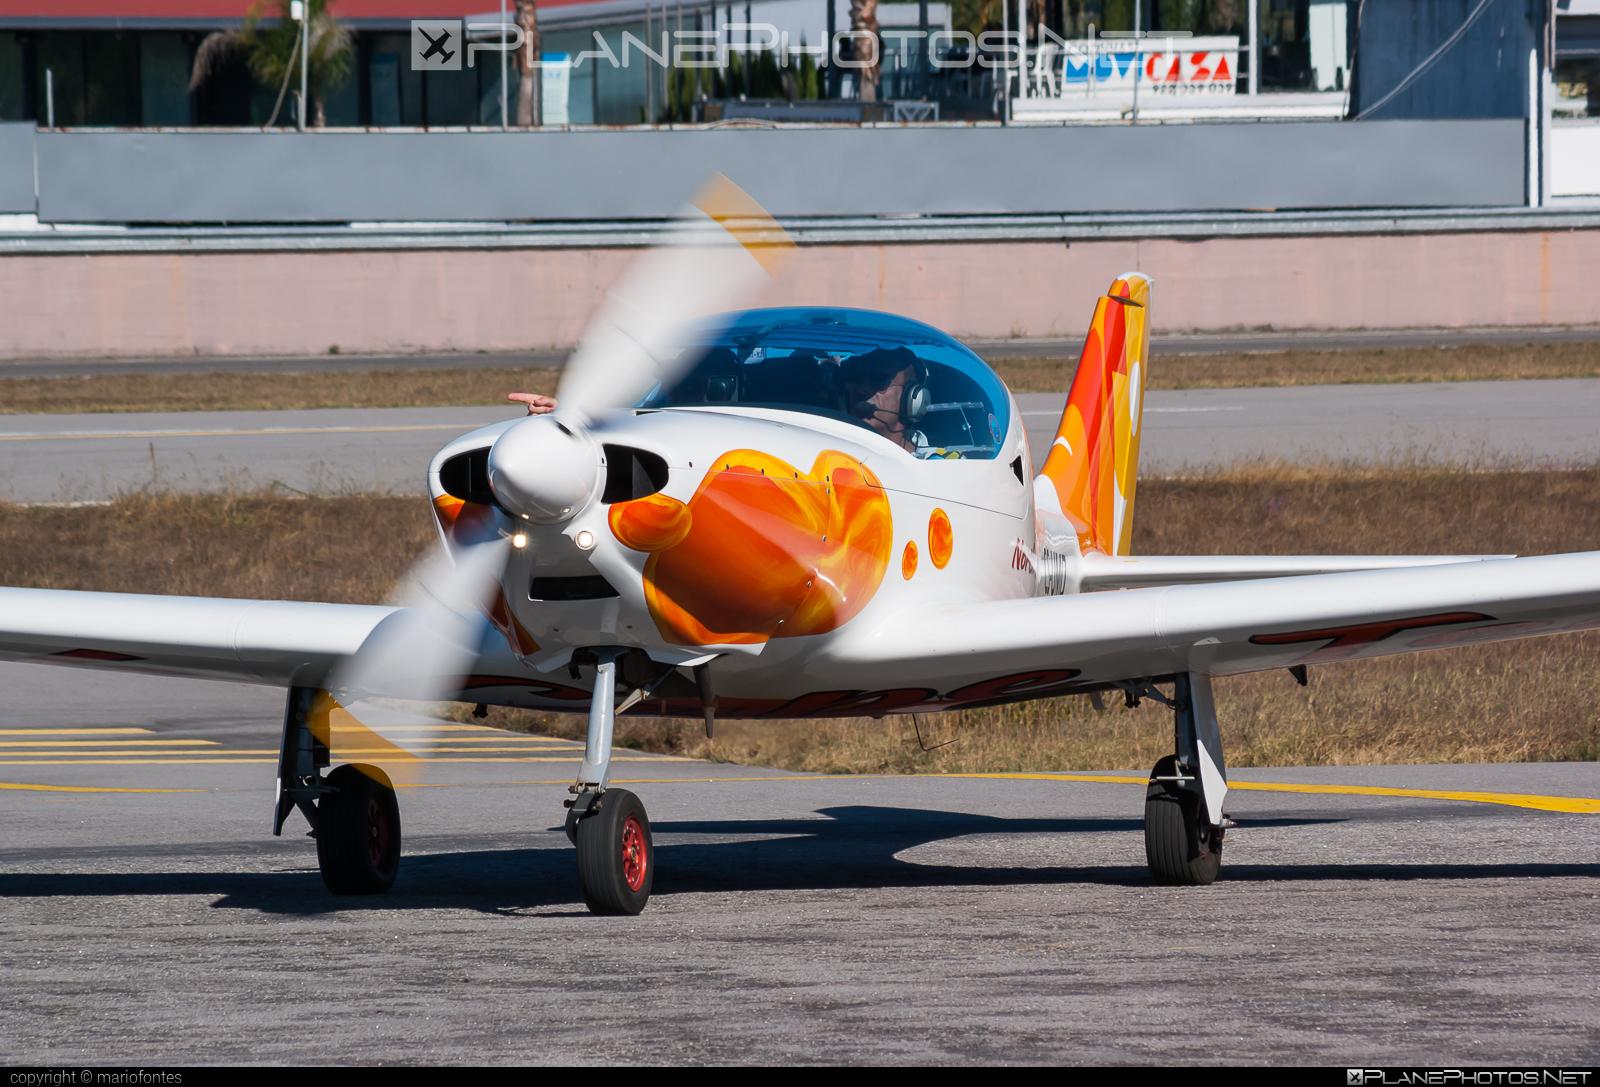 Aerospool WT9 Dynamic - CS-UMD operated by Private operator #aerospool #wt9 #wt9dynamic